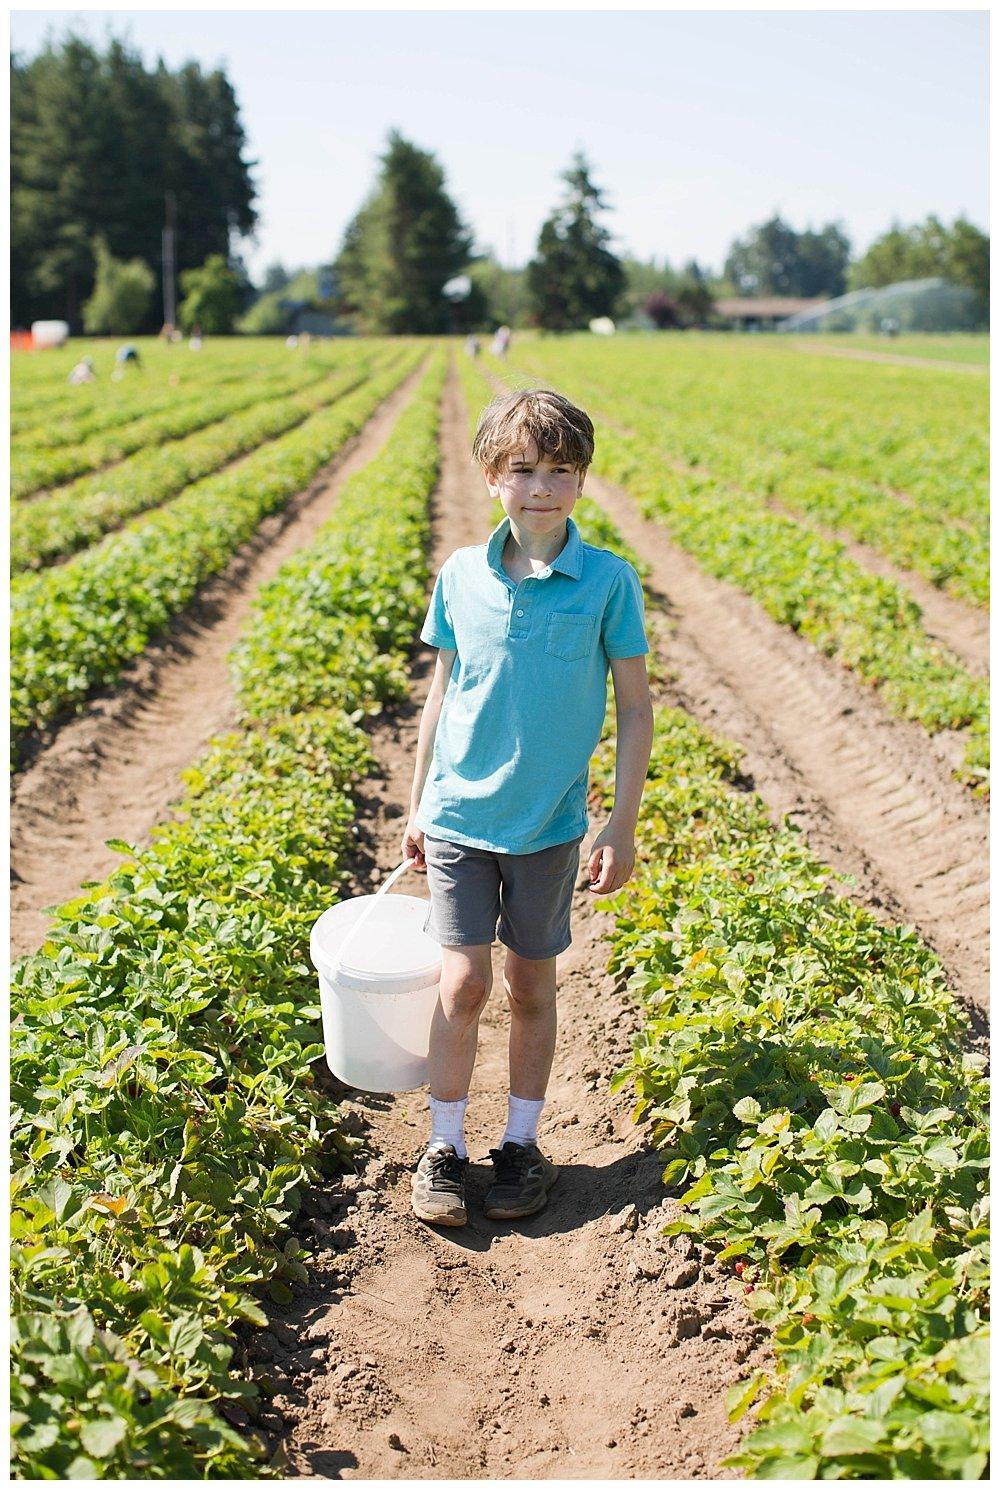 Apollo picking strawberries at the U-Pick strawberry farm.